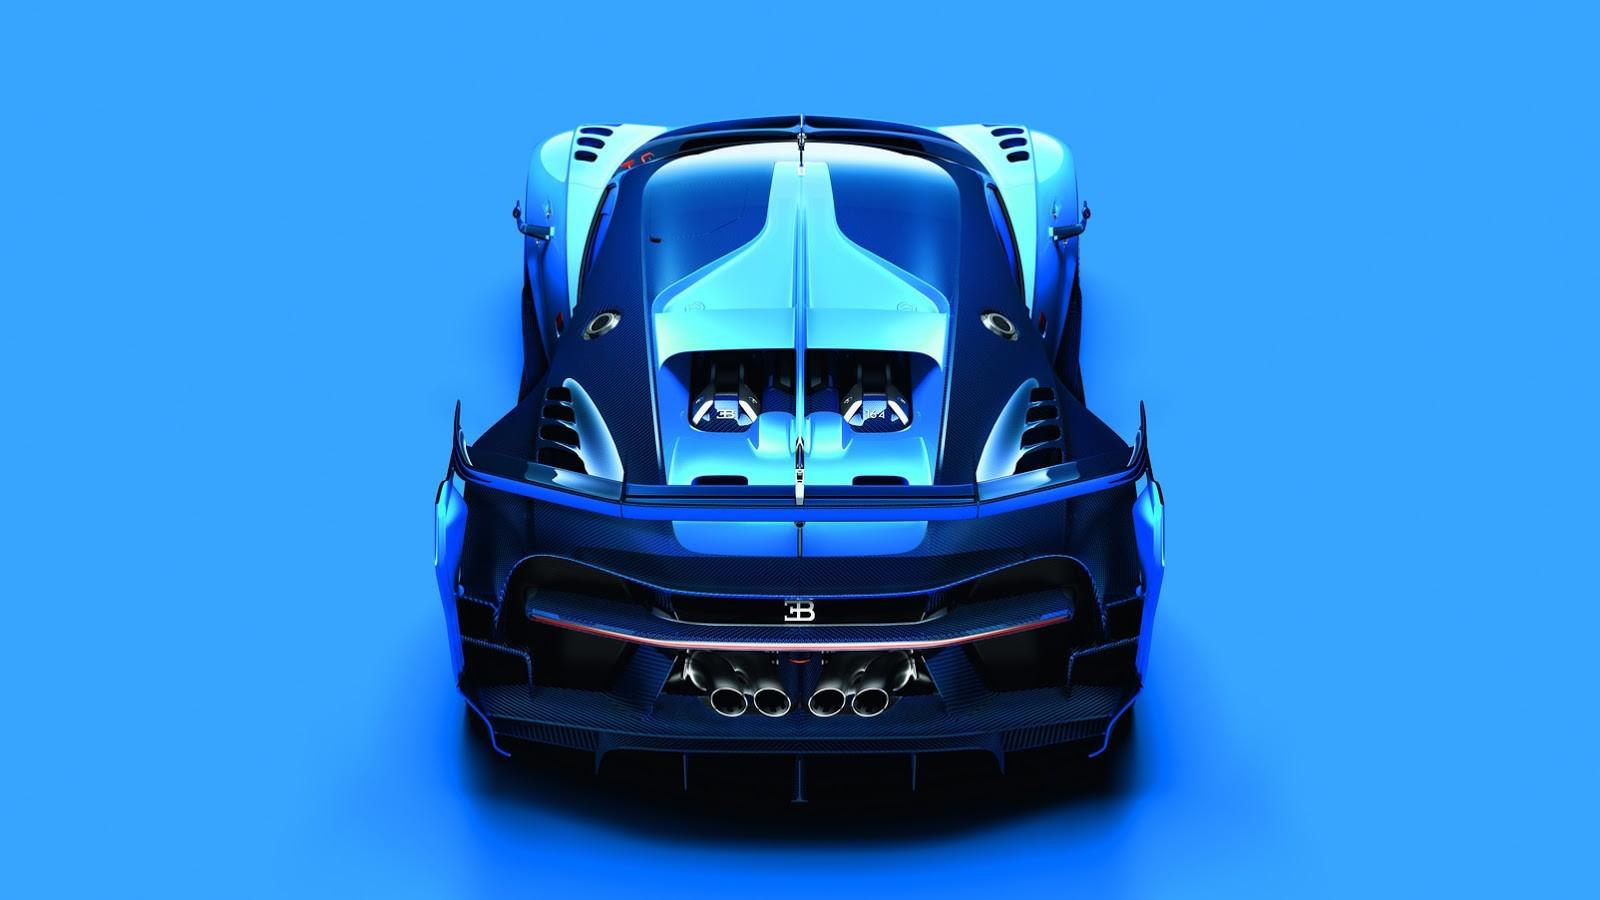 Bugatti Chiron Grand Sport Roadster Rendering Looks Cool ...